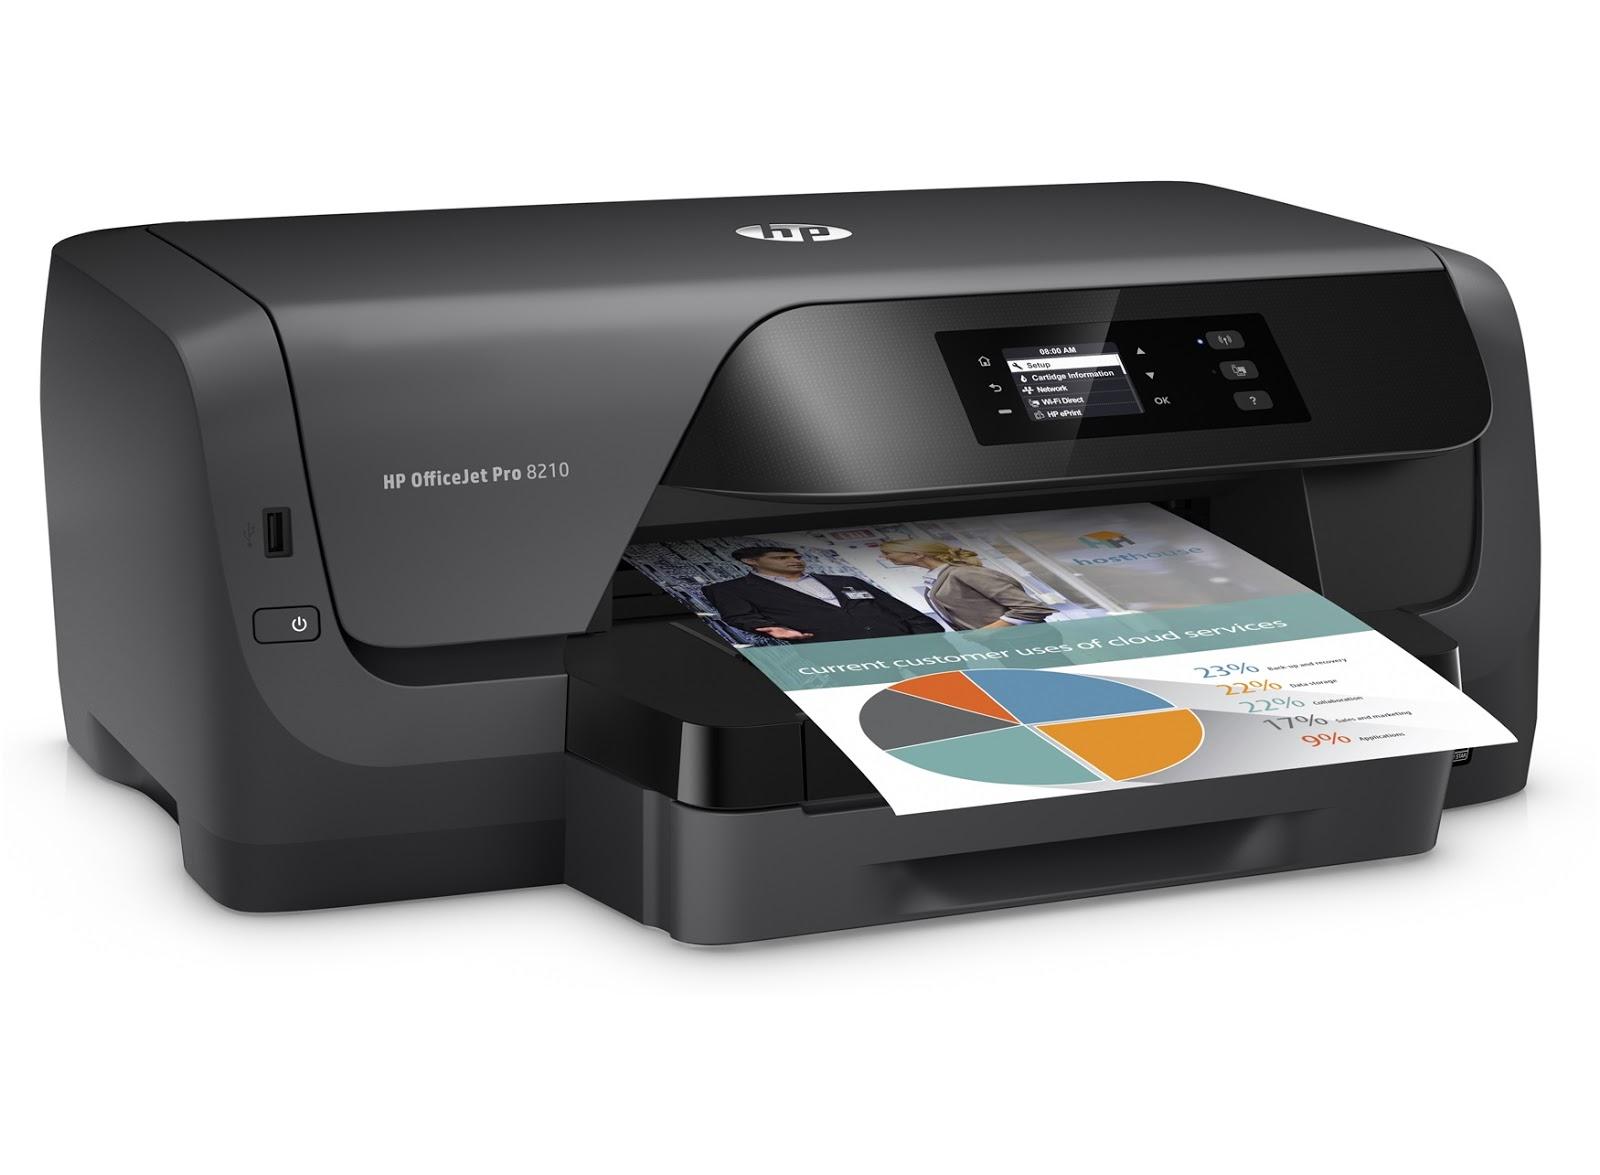 hp officejet pro 8210 printer driver download driver and software. Black Bedroom Furniture Sets. Home Design Ideas